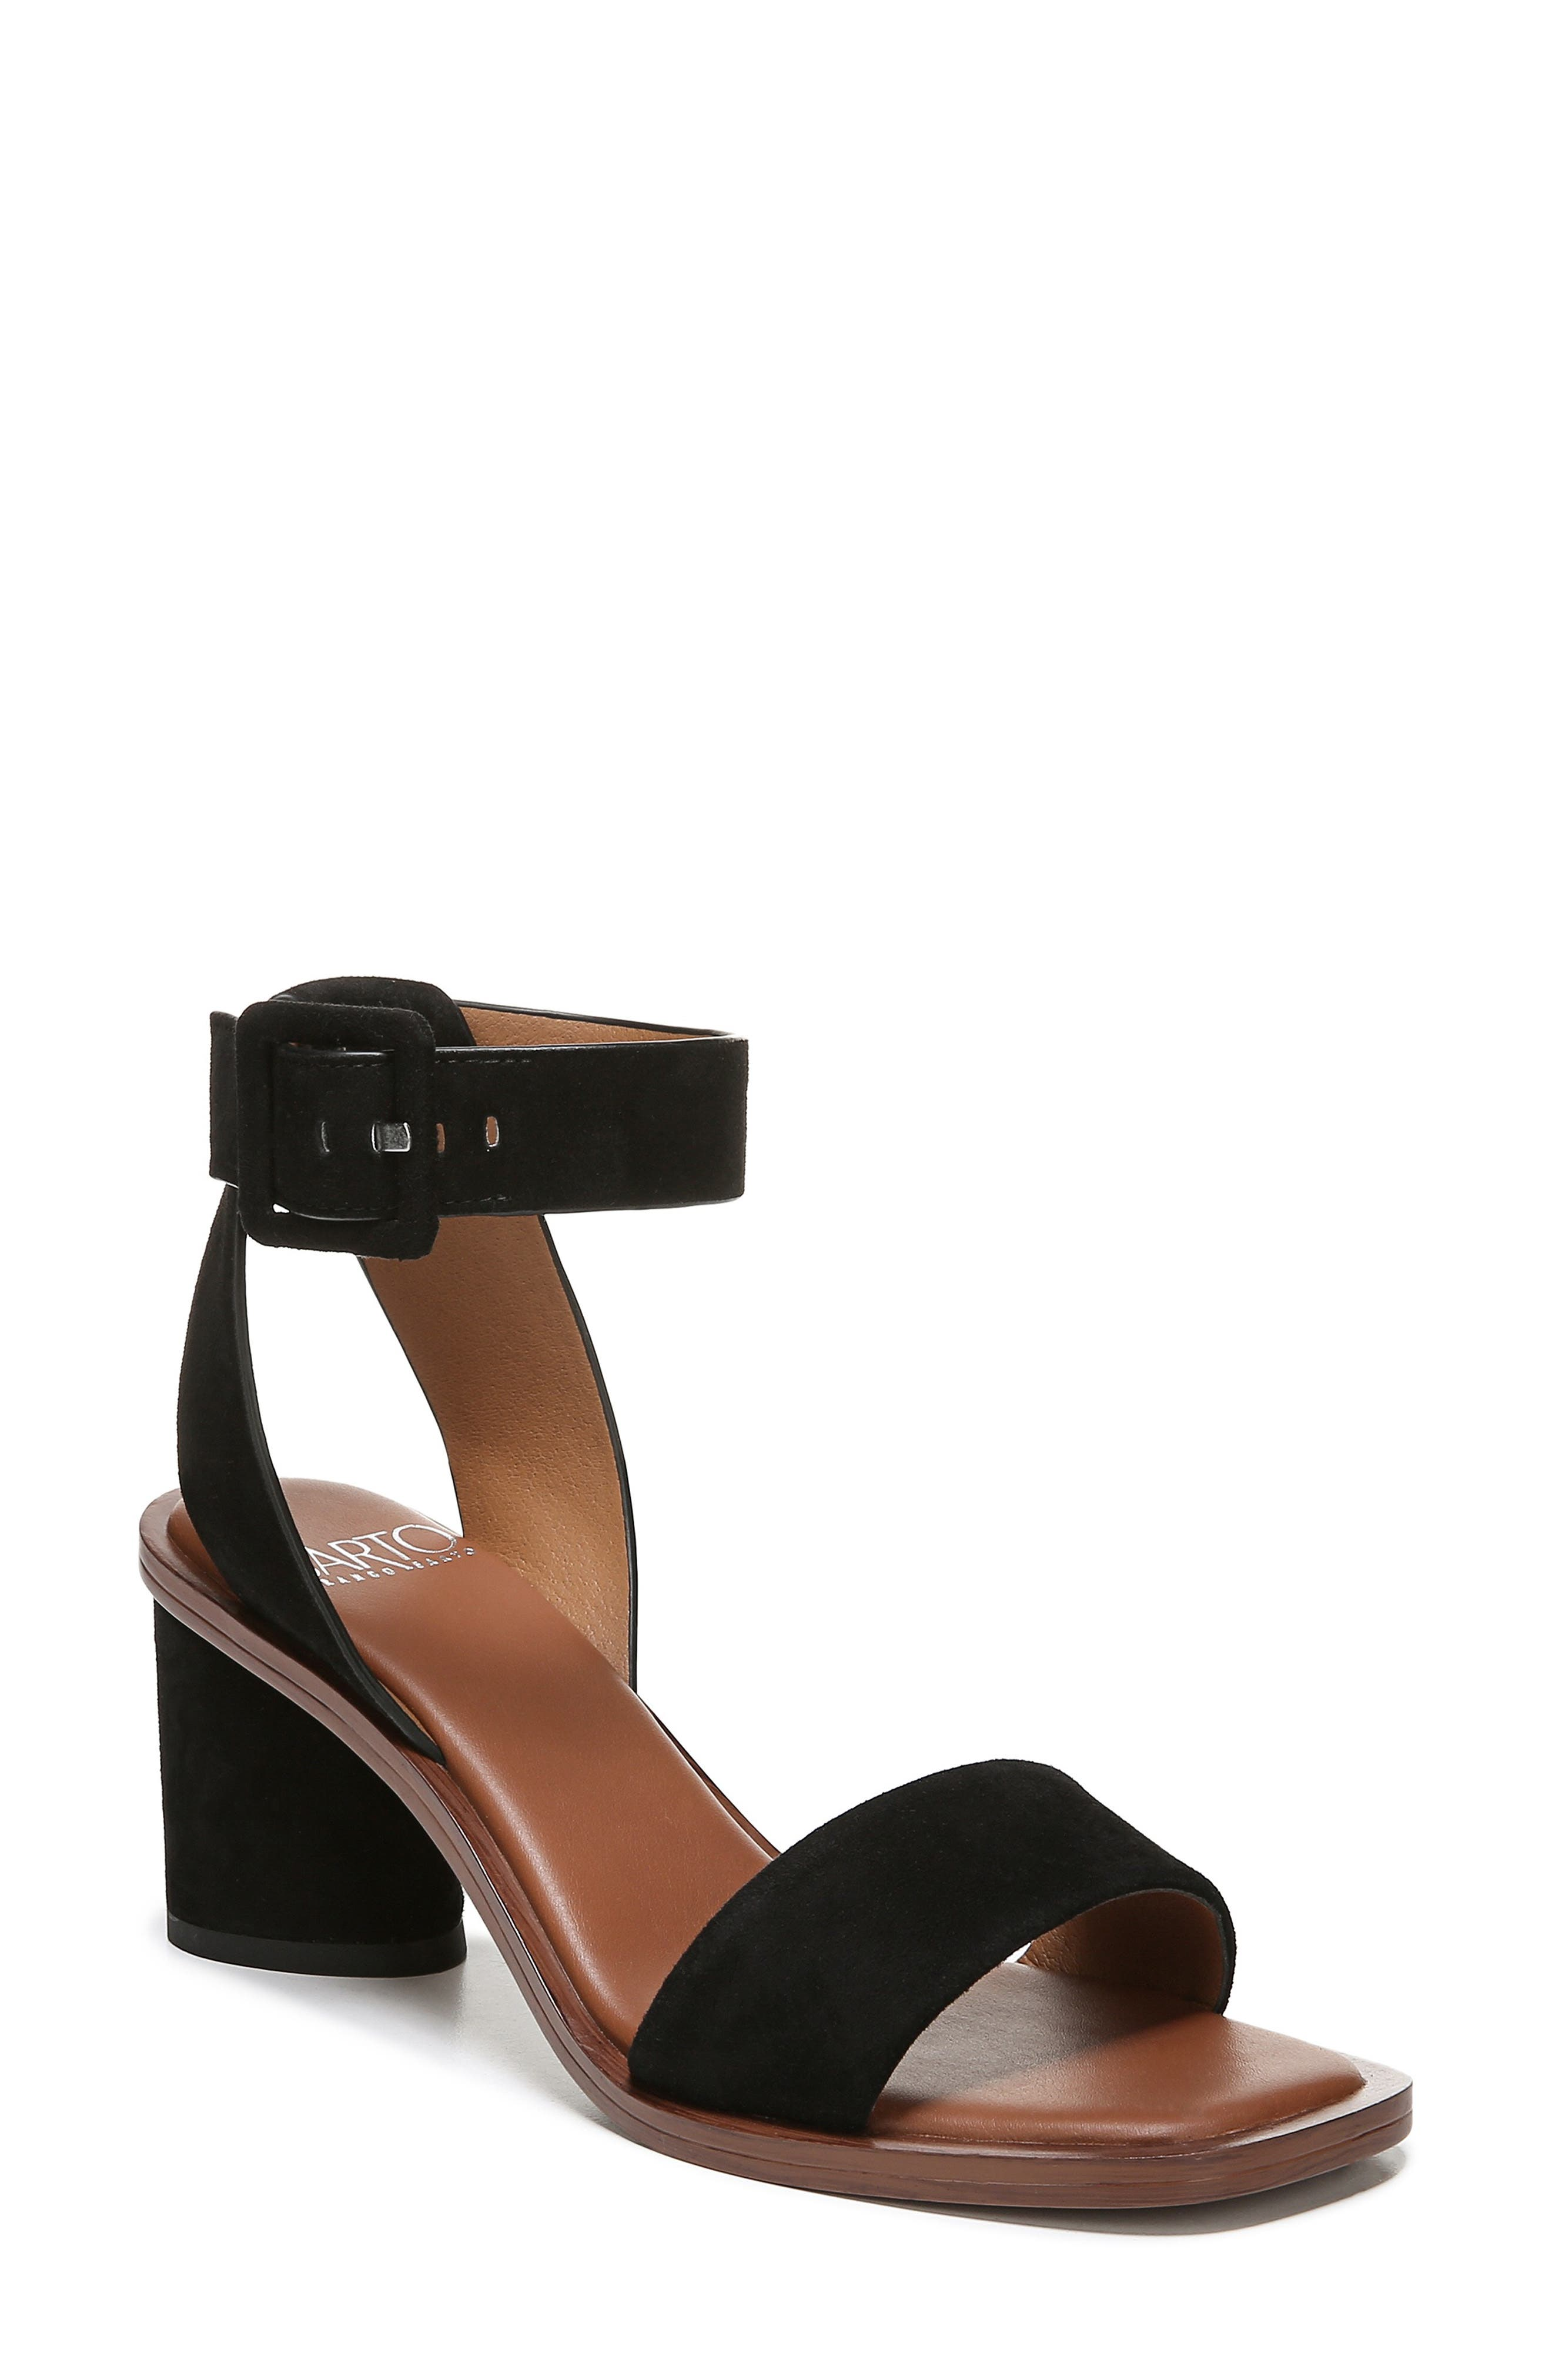 Risa Strap Sandal, Main, color, BLACK SUEDE